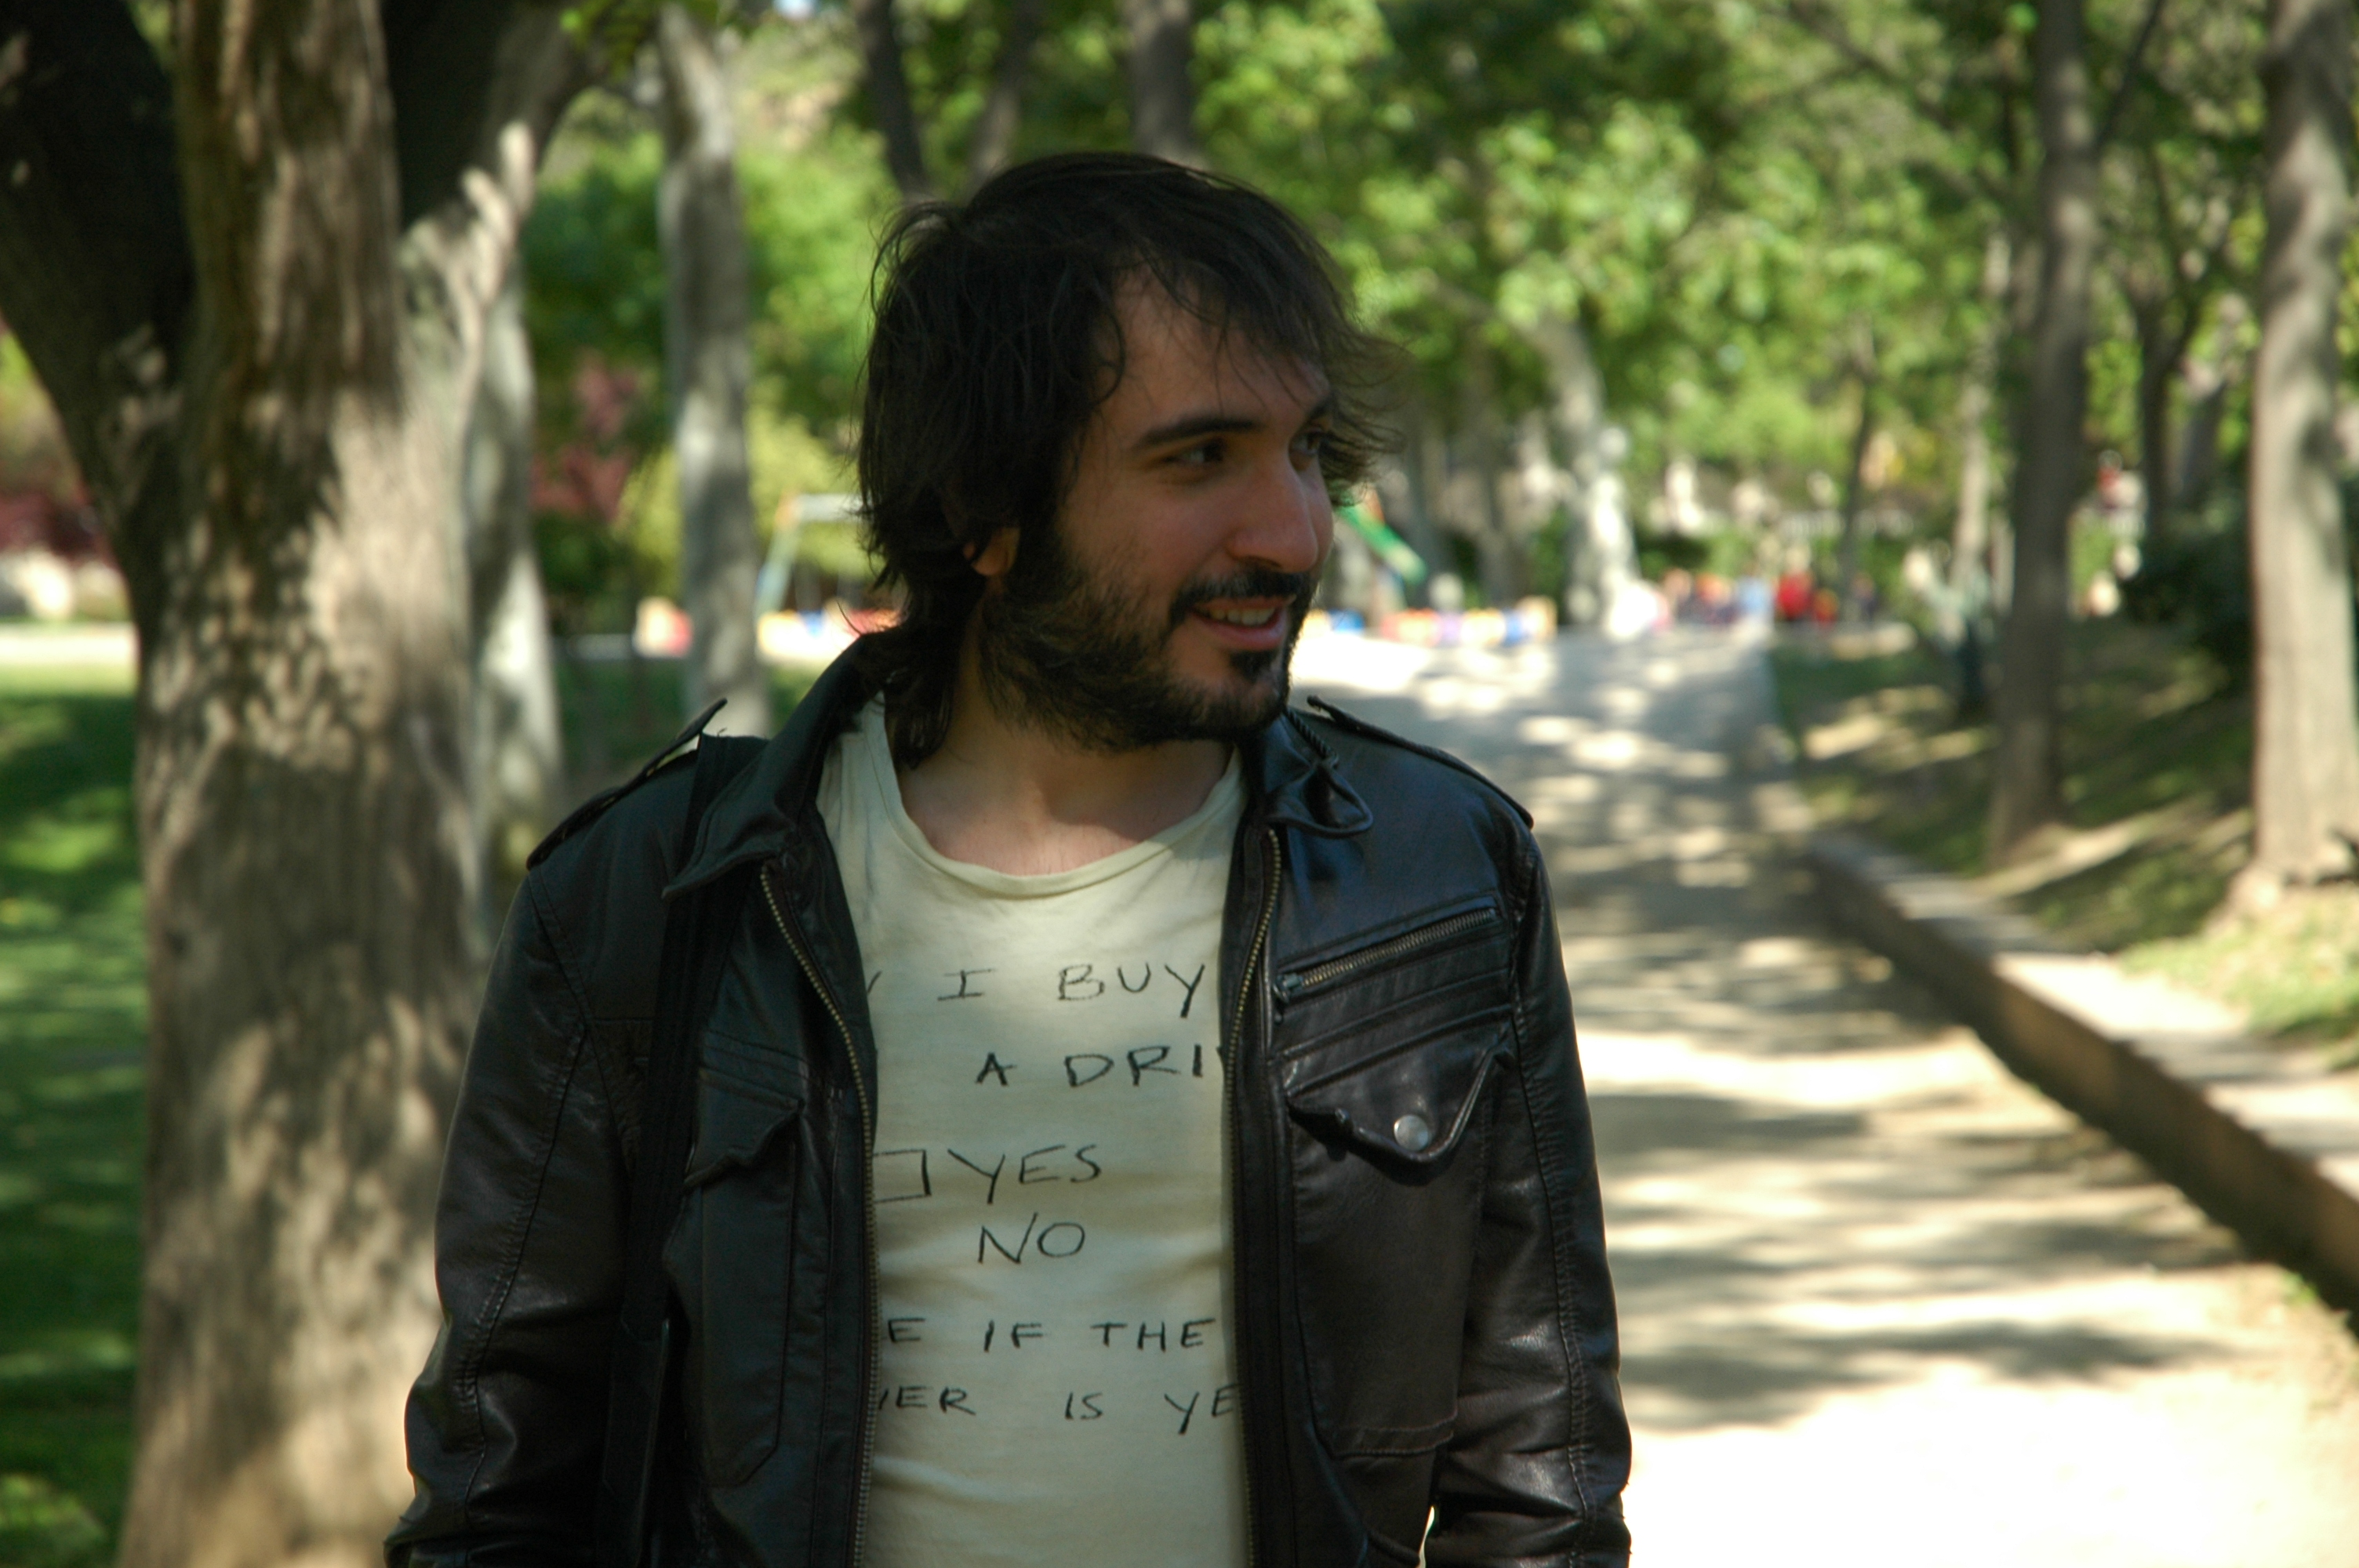 Book_1_David_Pallás_Gozalo_Parque_66